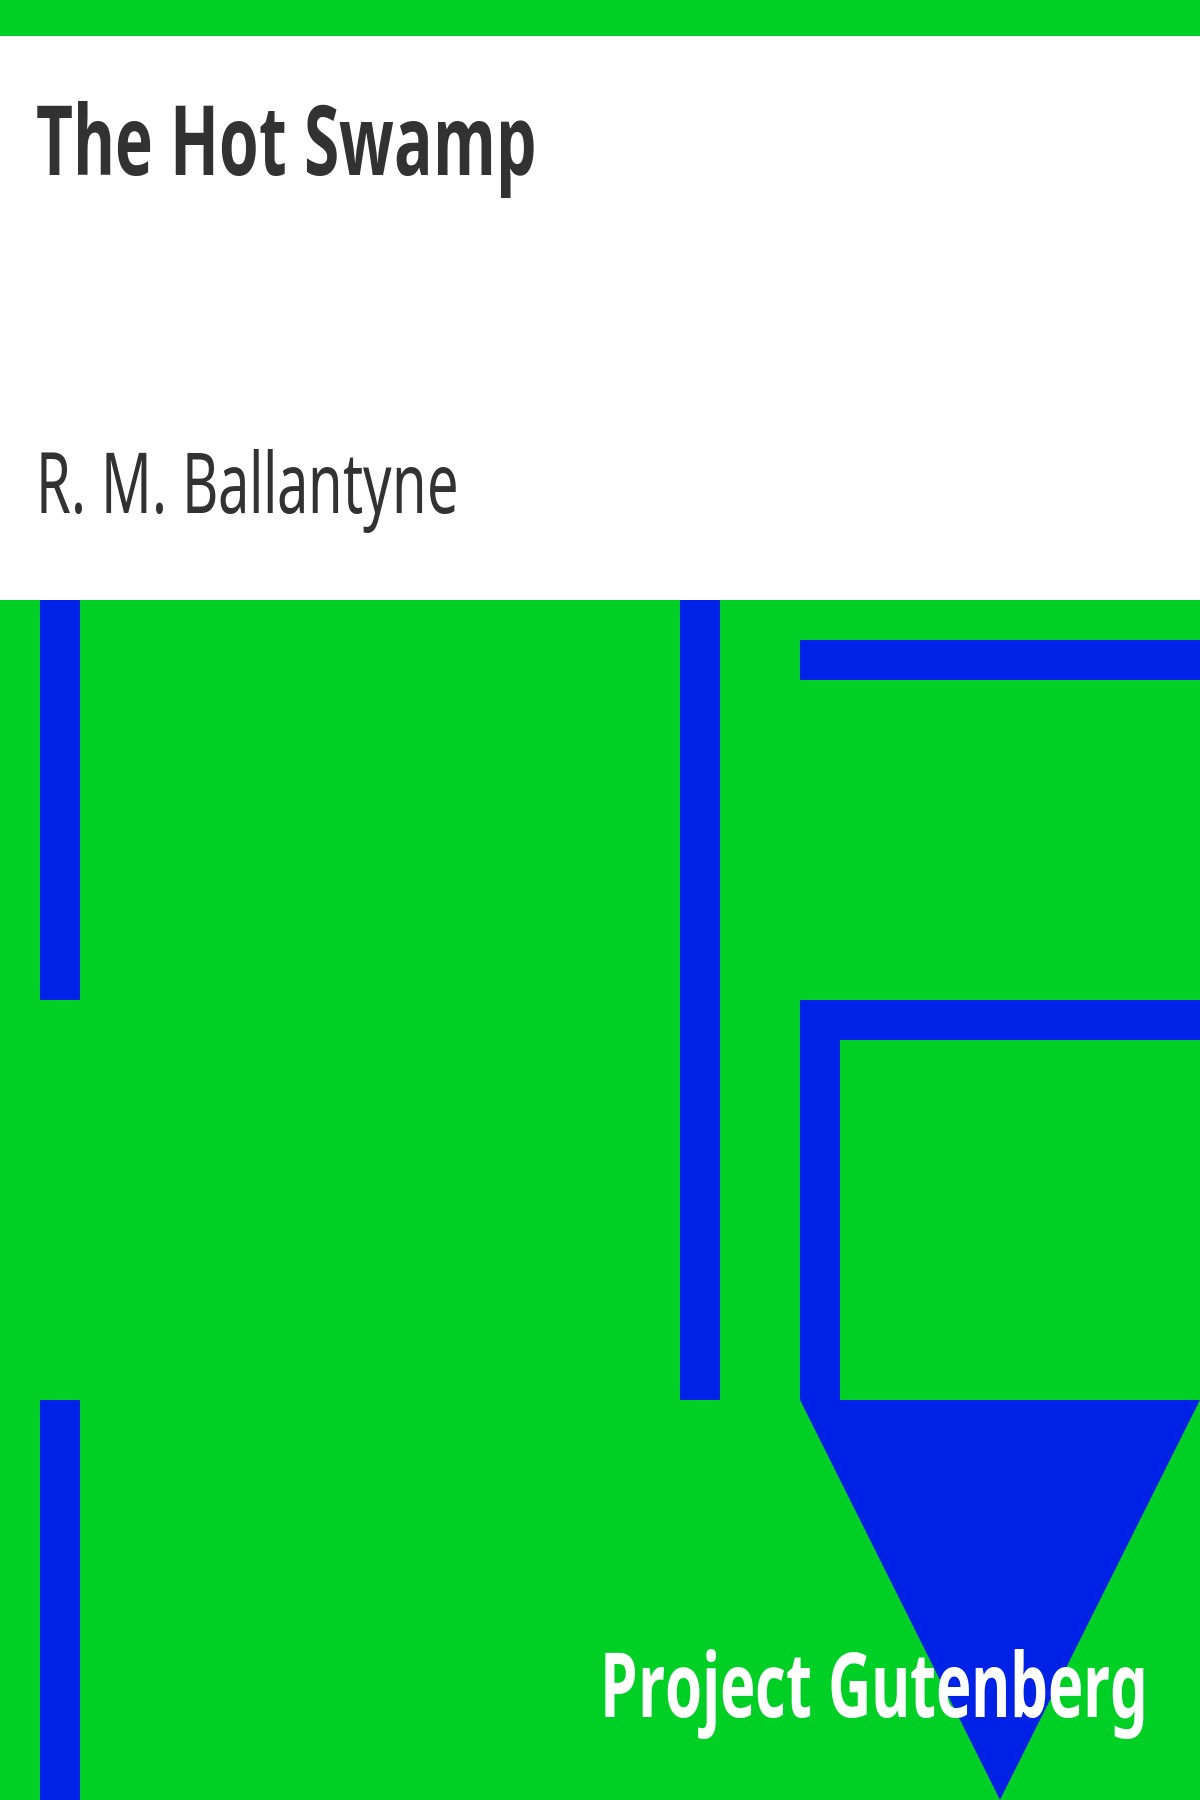 R. M. Ballantyne The Hot Swamp